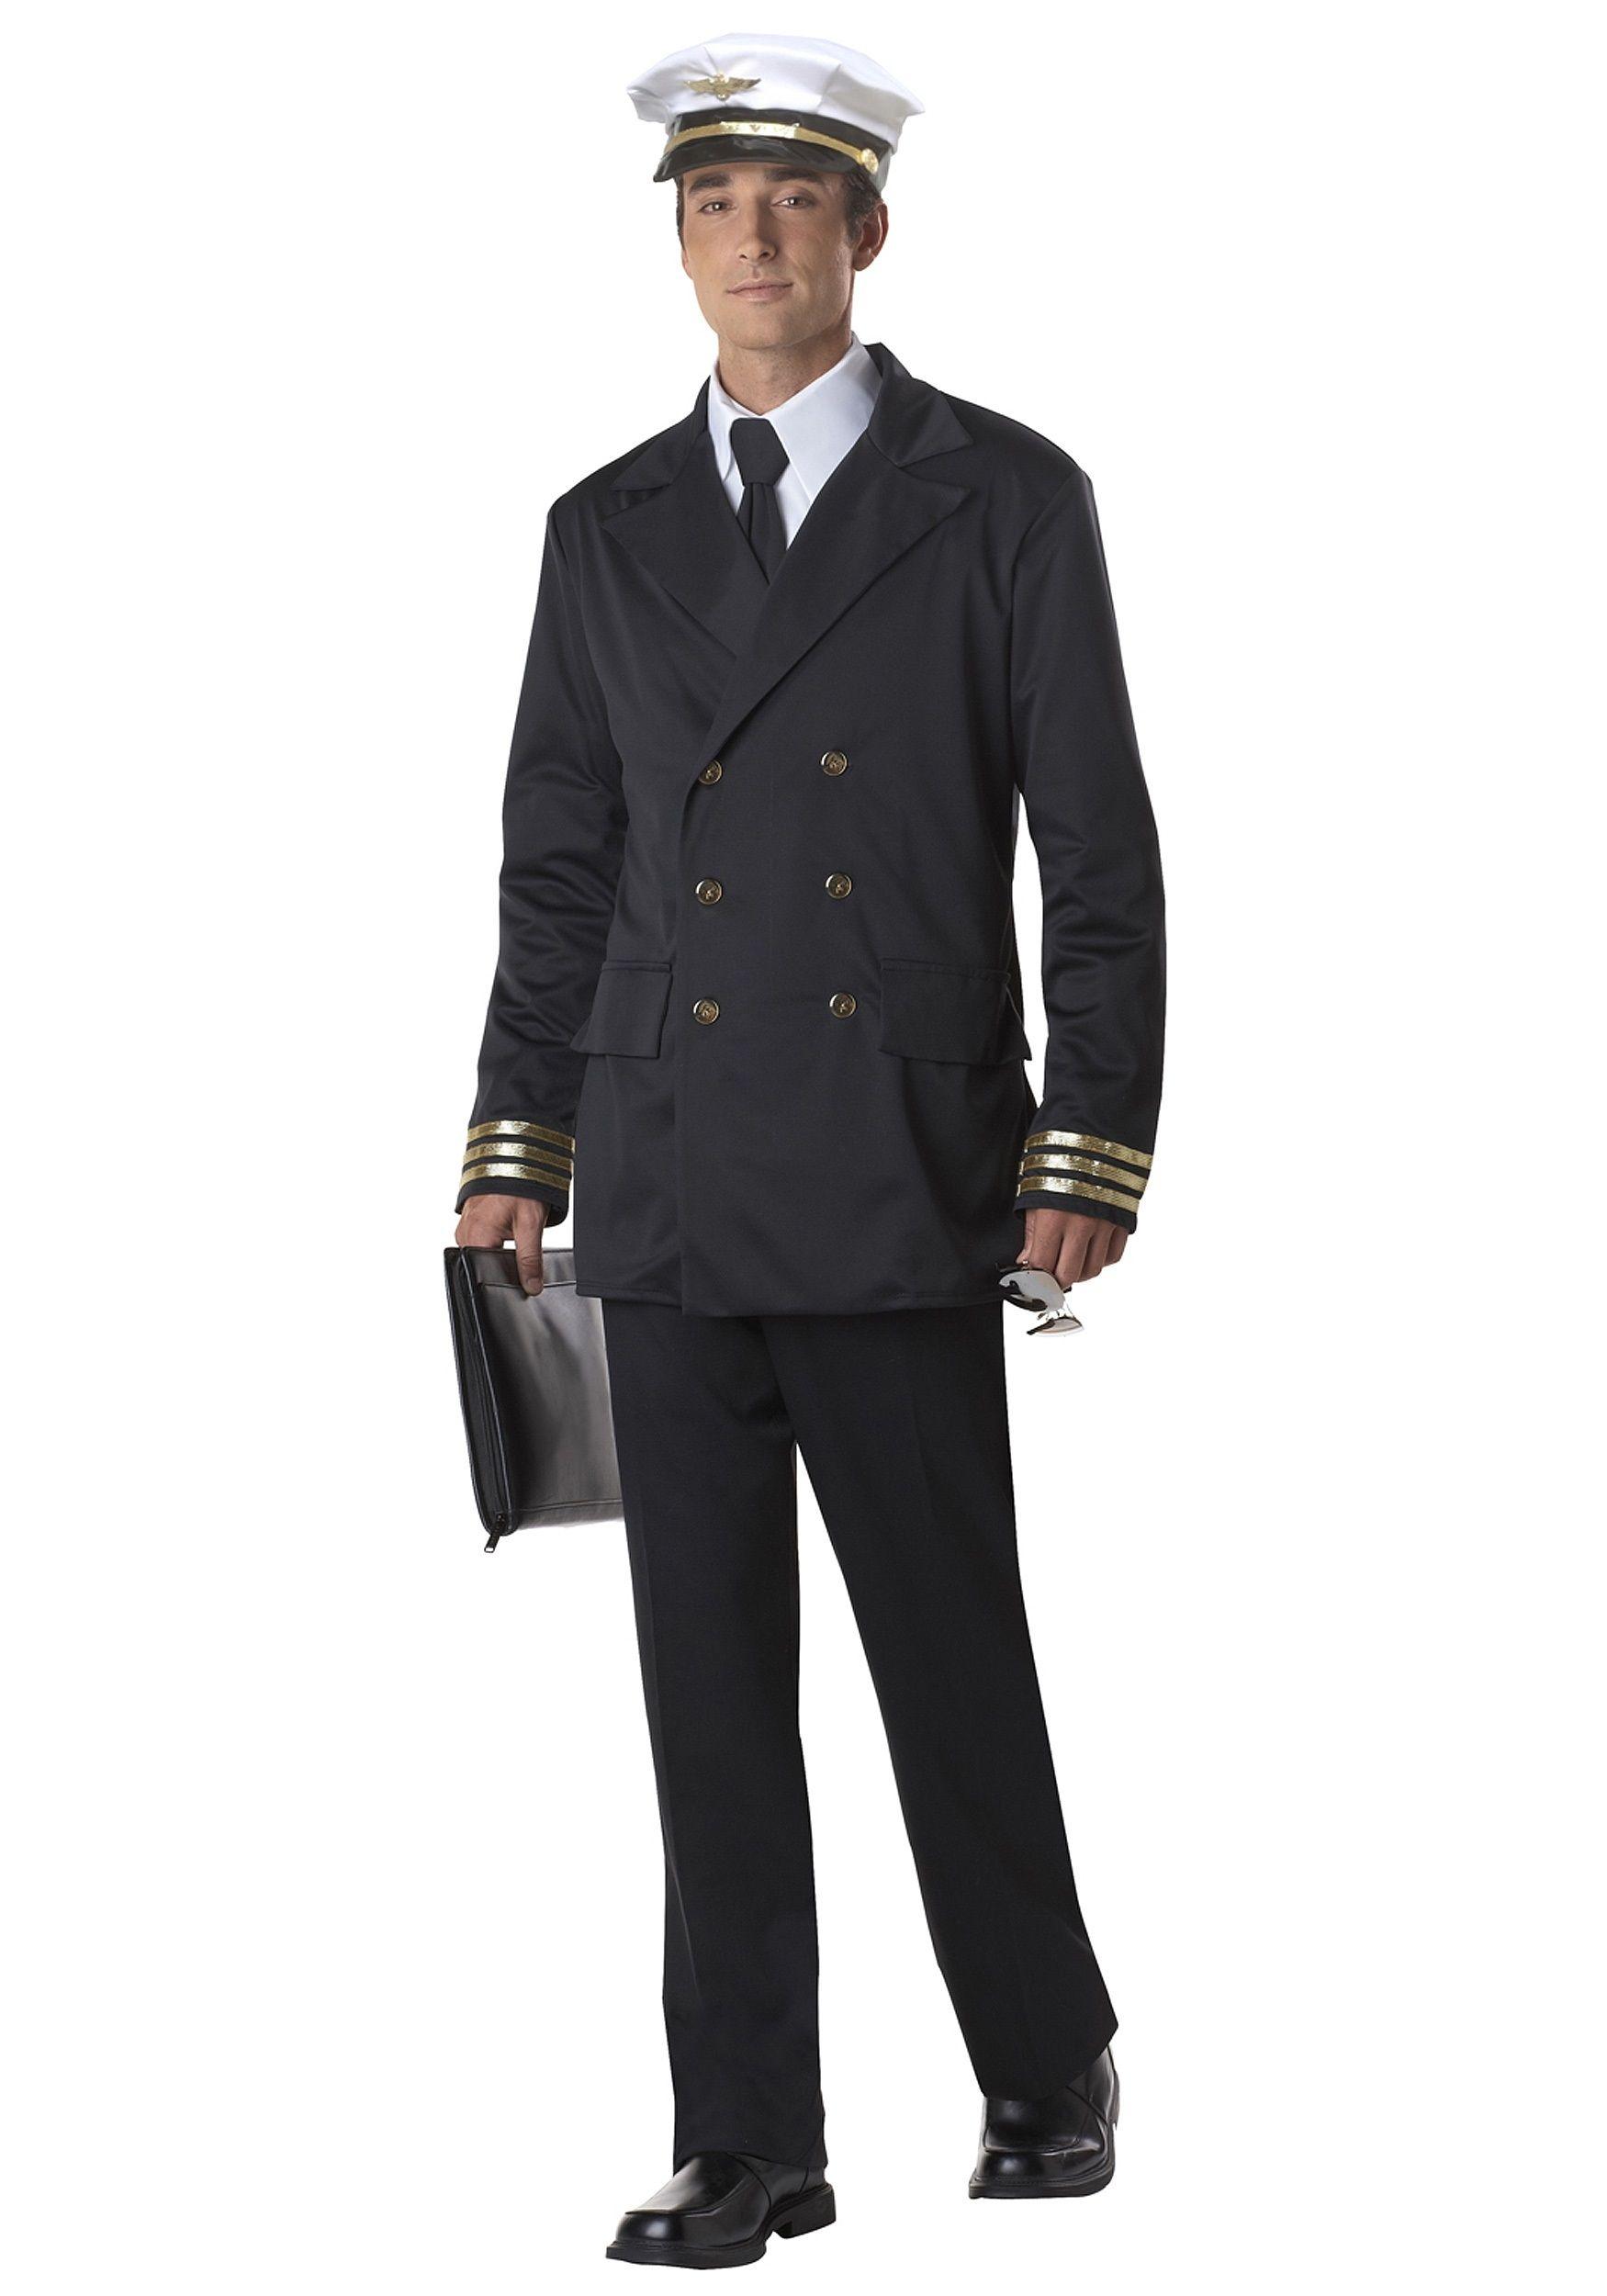 Костюм ретро-пилота (54) - Униформа, р.54